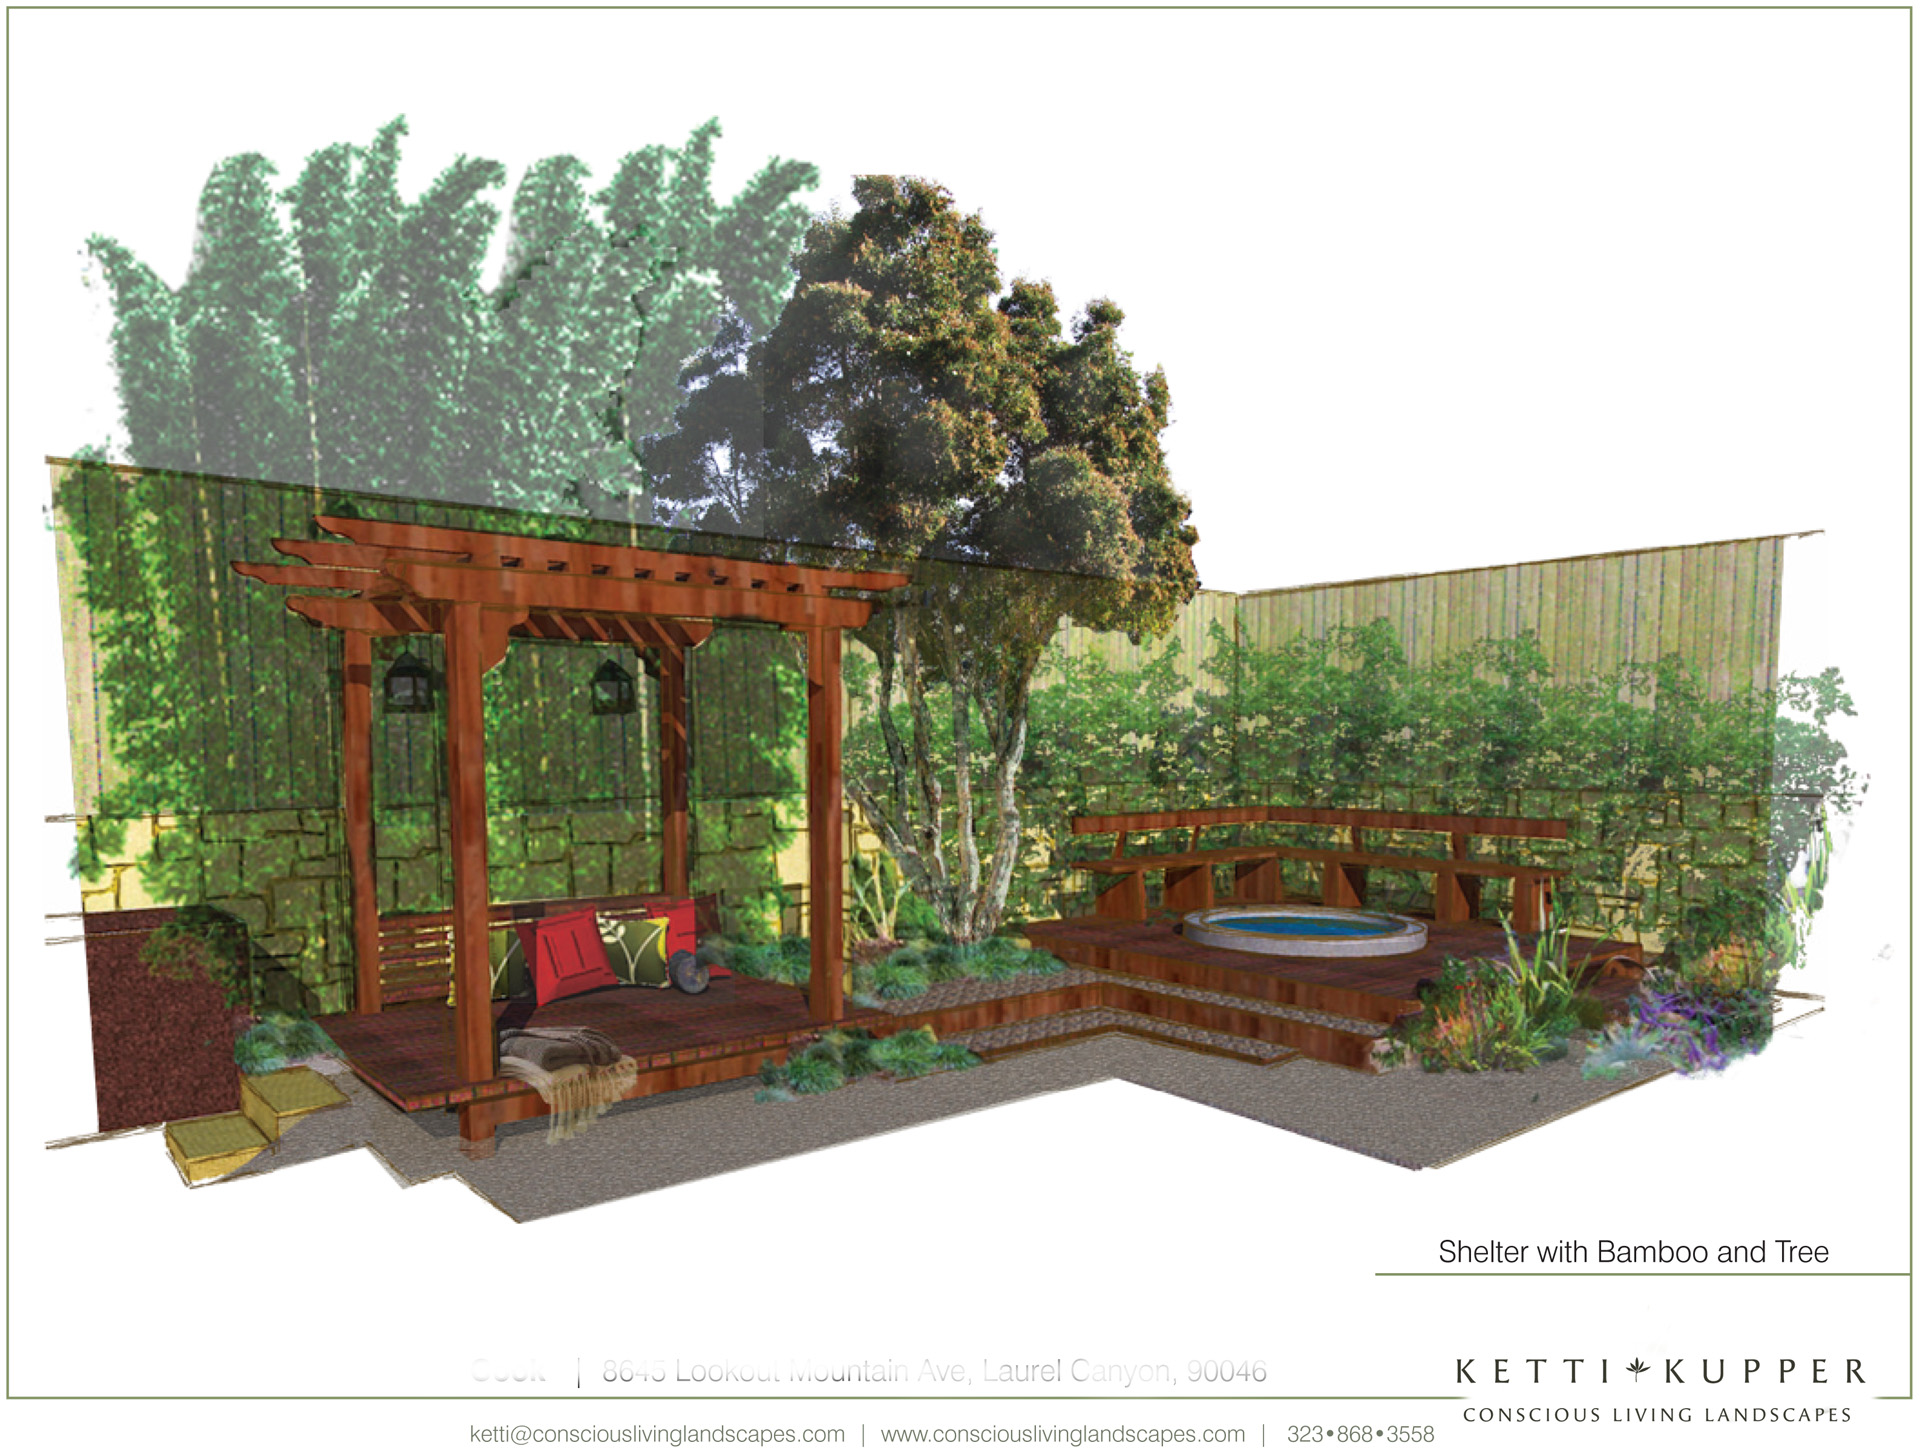 9Cook_Meditation Hut Rendering.Ketti.Kupper.jpg